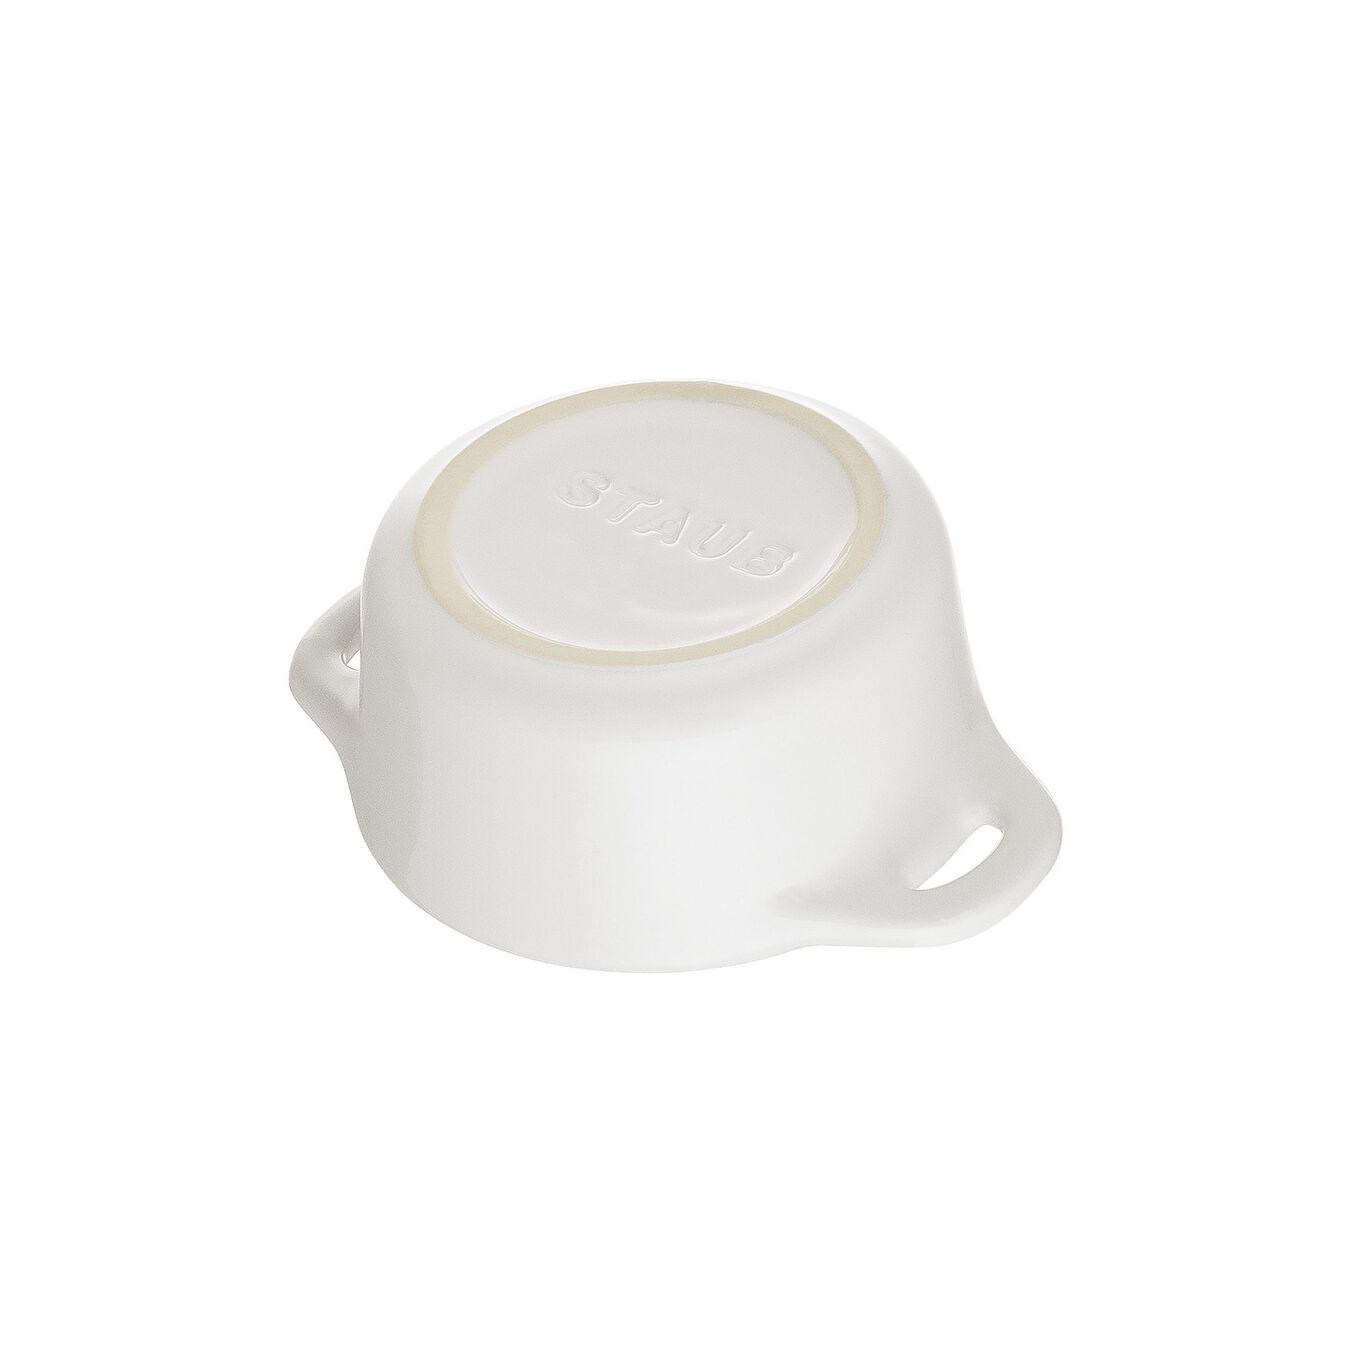 Mini Cocotte 10 cm, redondo, Branco puro, Cerâmica,,large 4